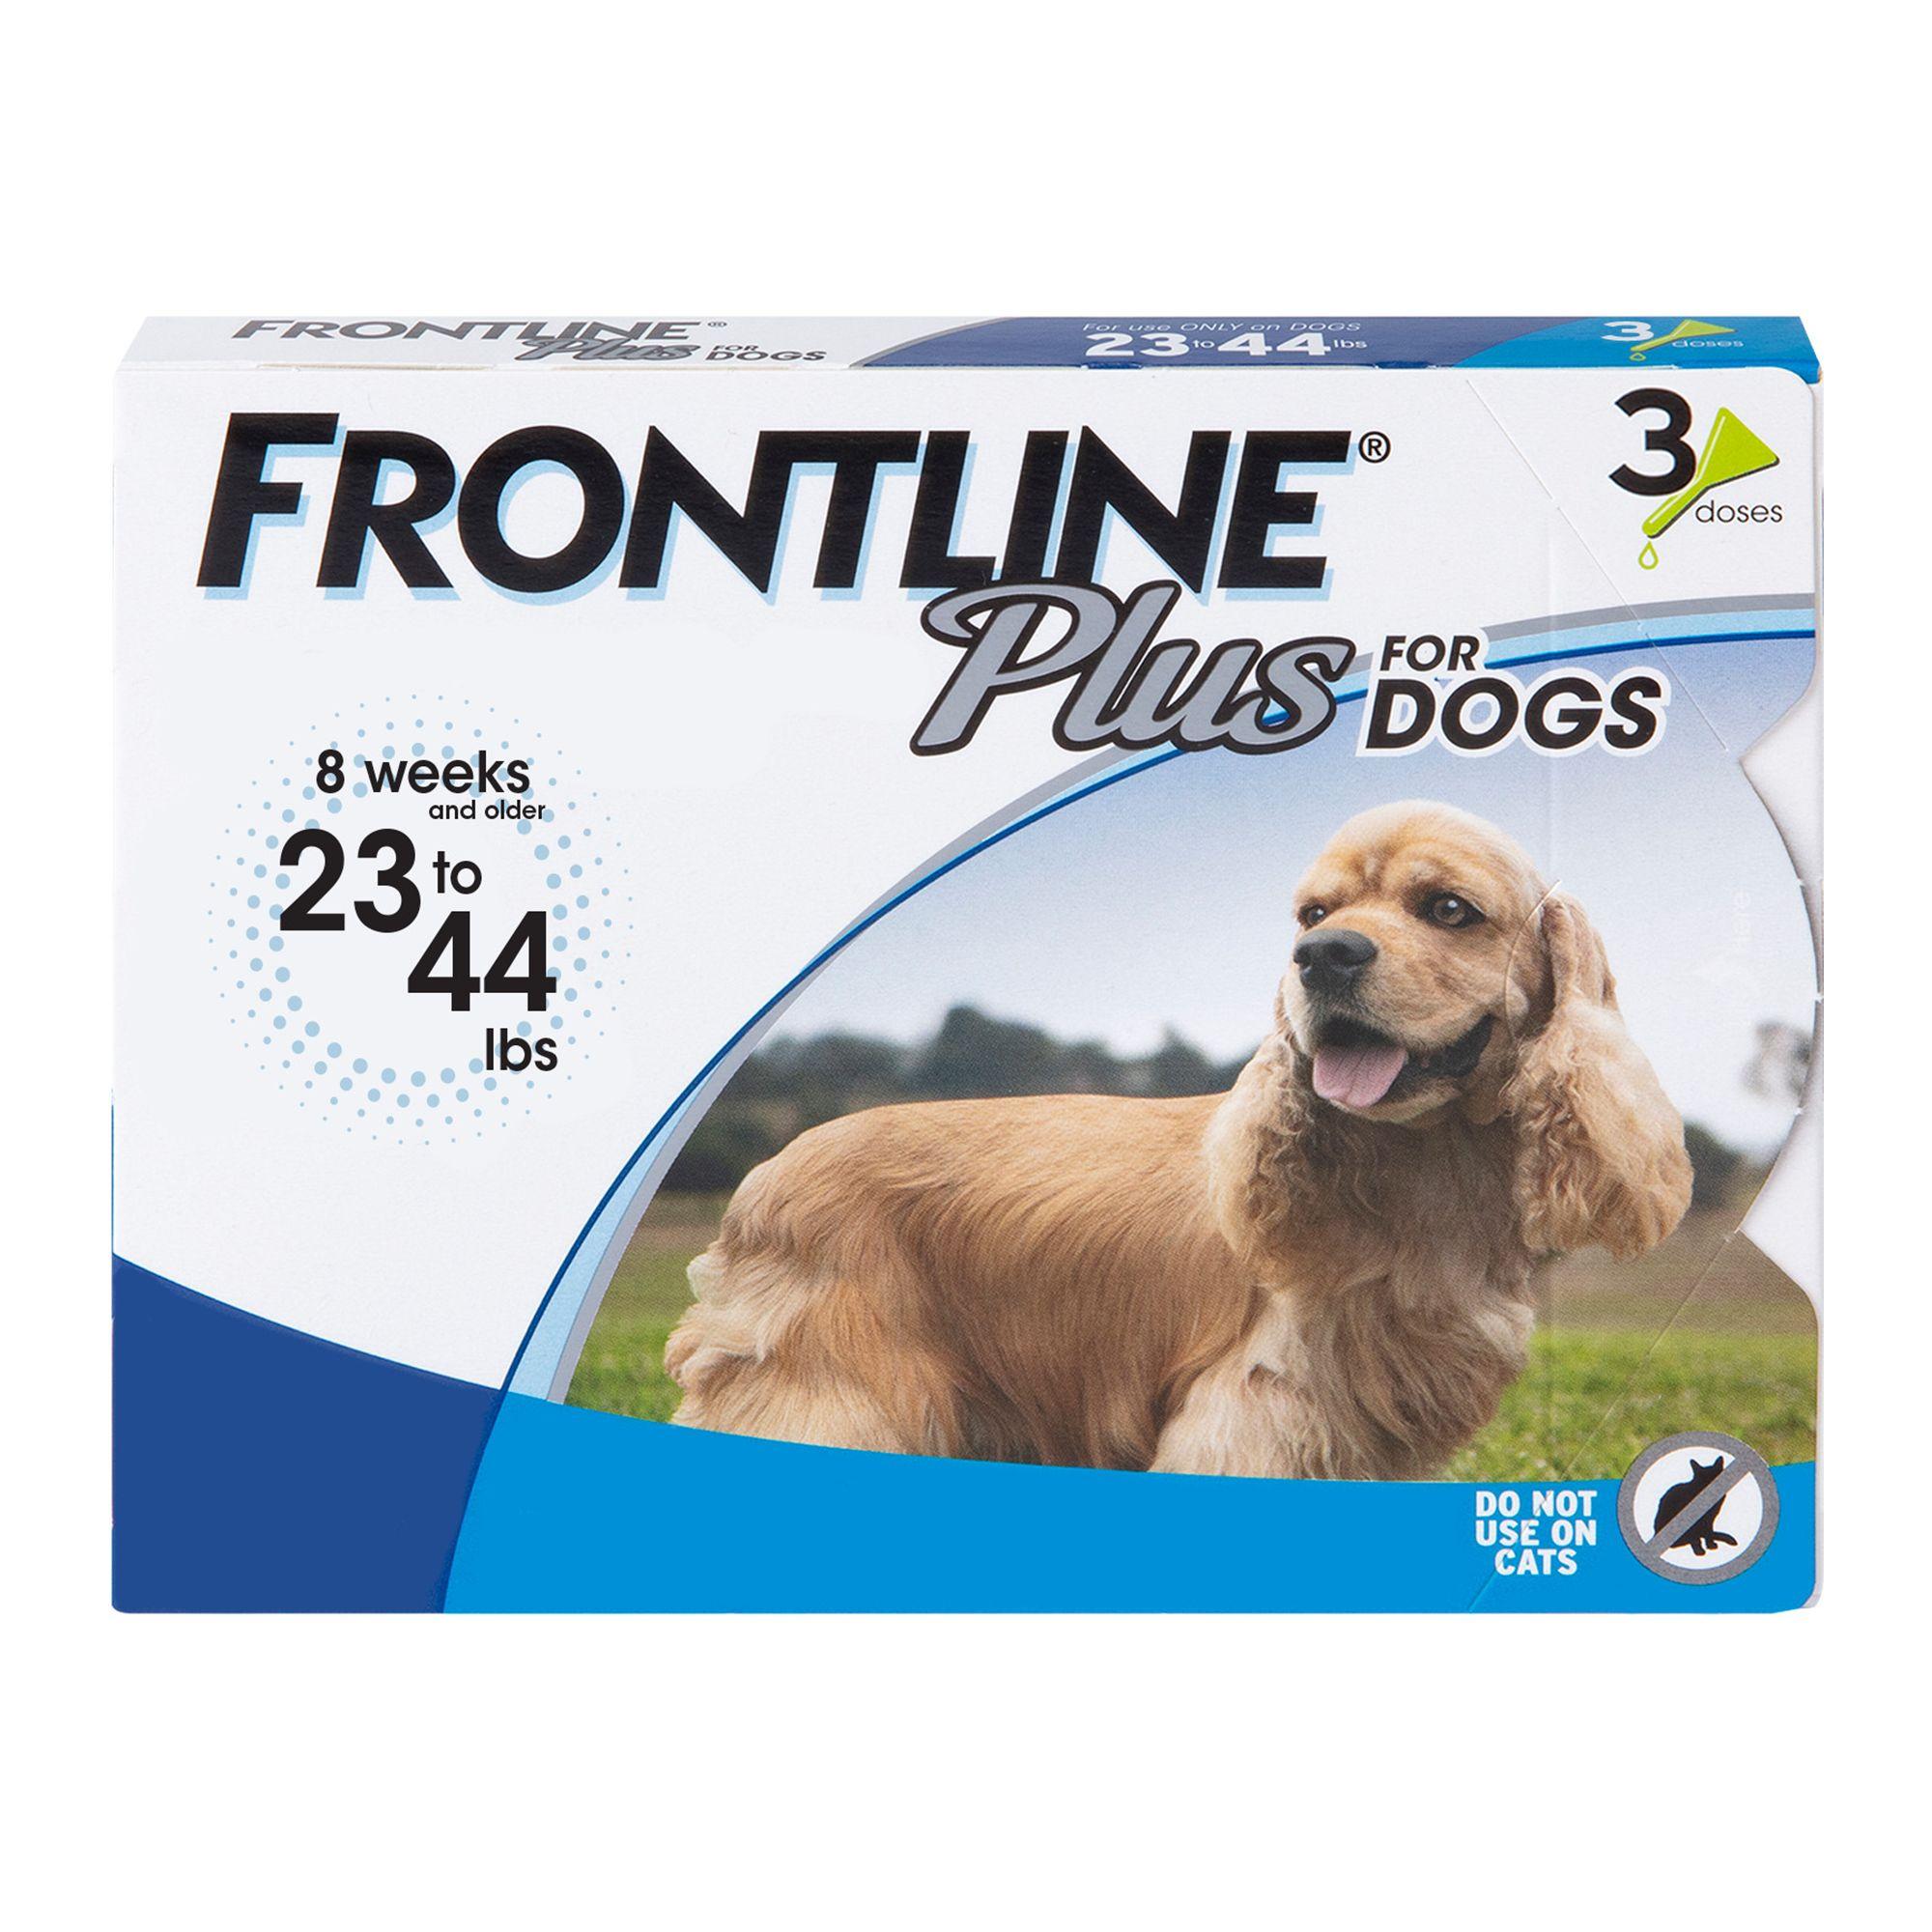 Frontline Plus 23 44 Lb Dog Flea And Tick Treatment Size 3 Count